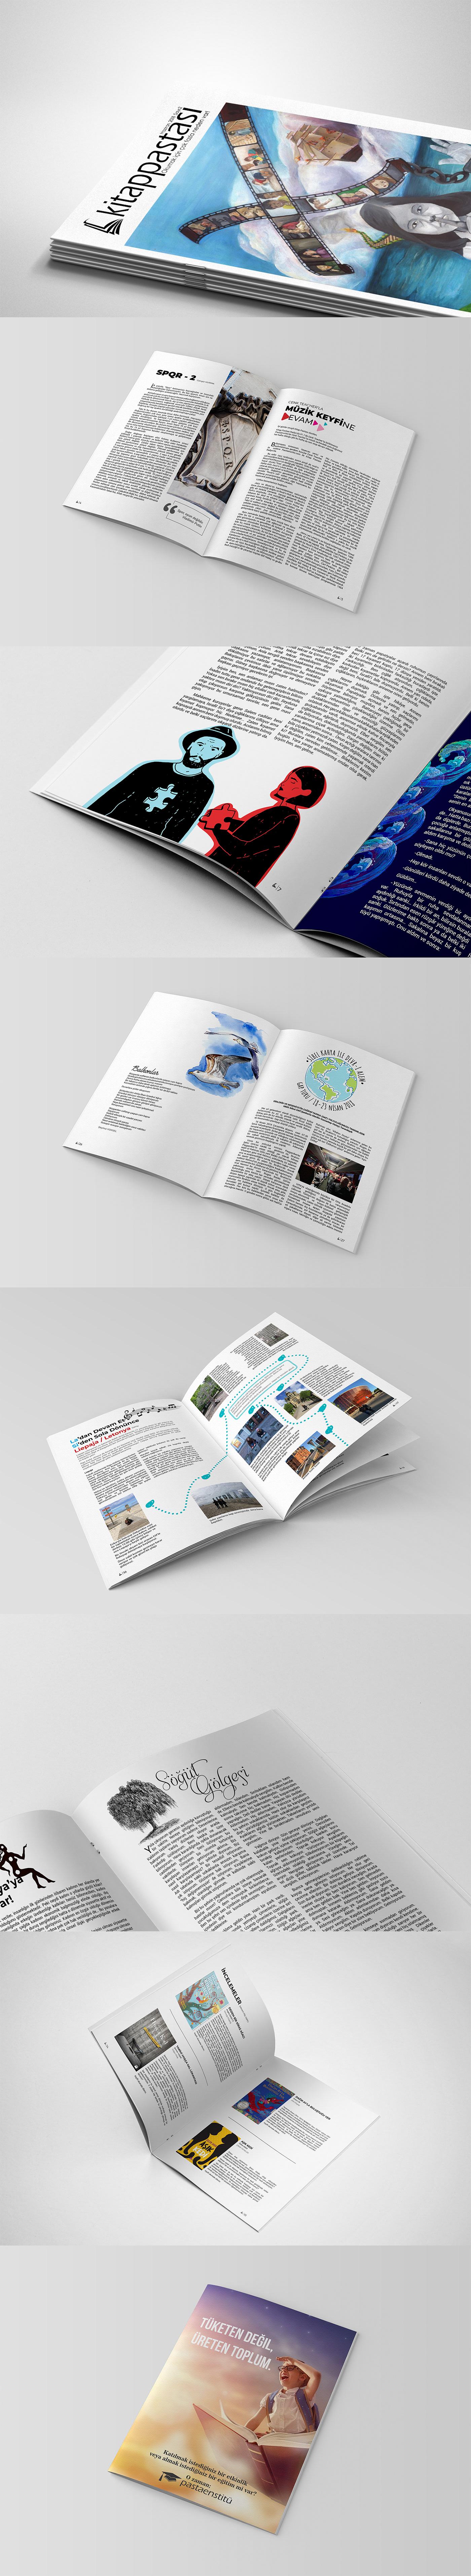 magazine design graphic minimal writing